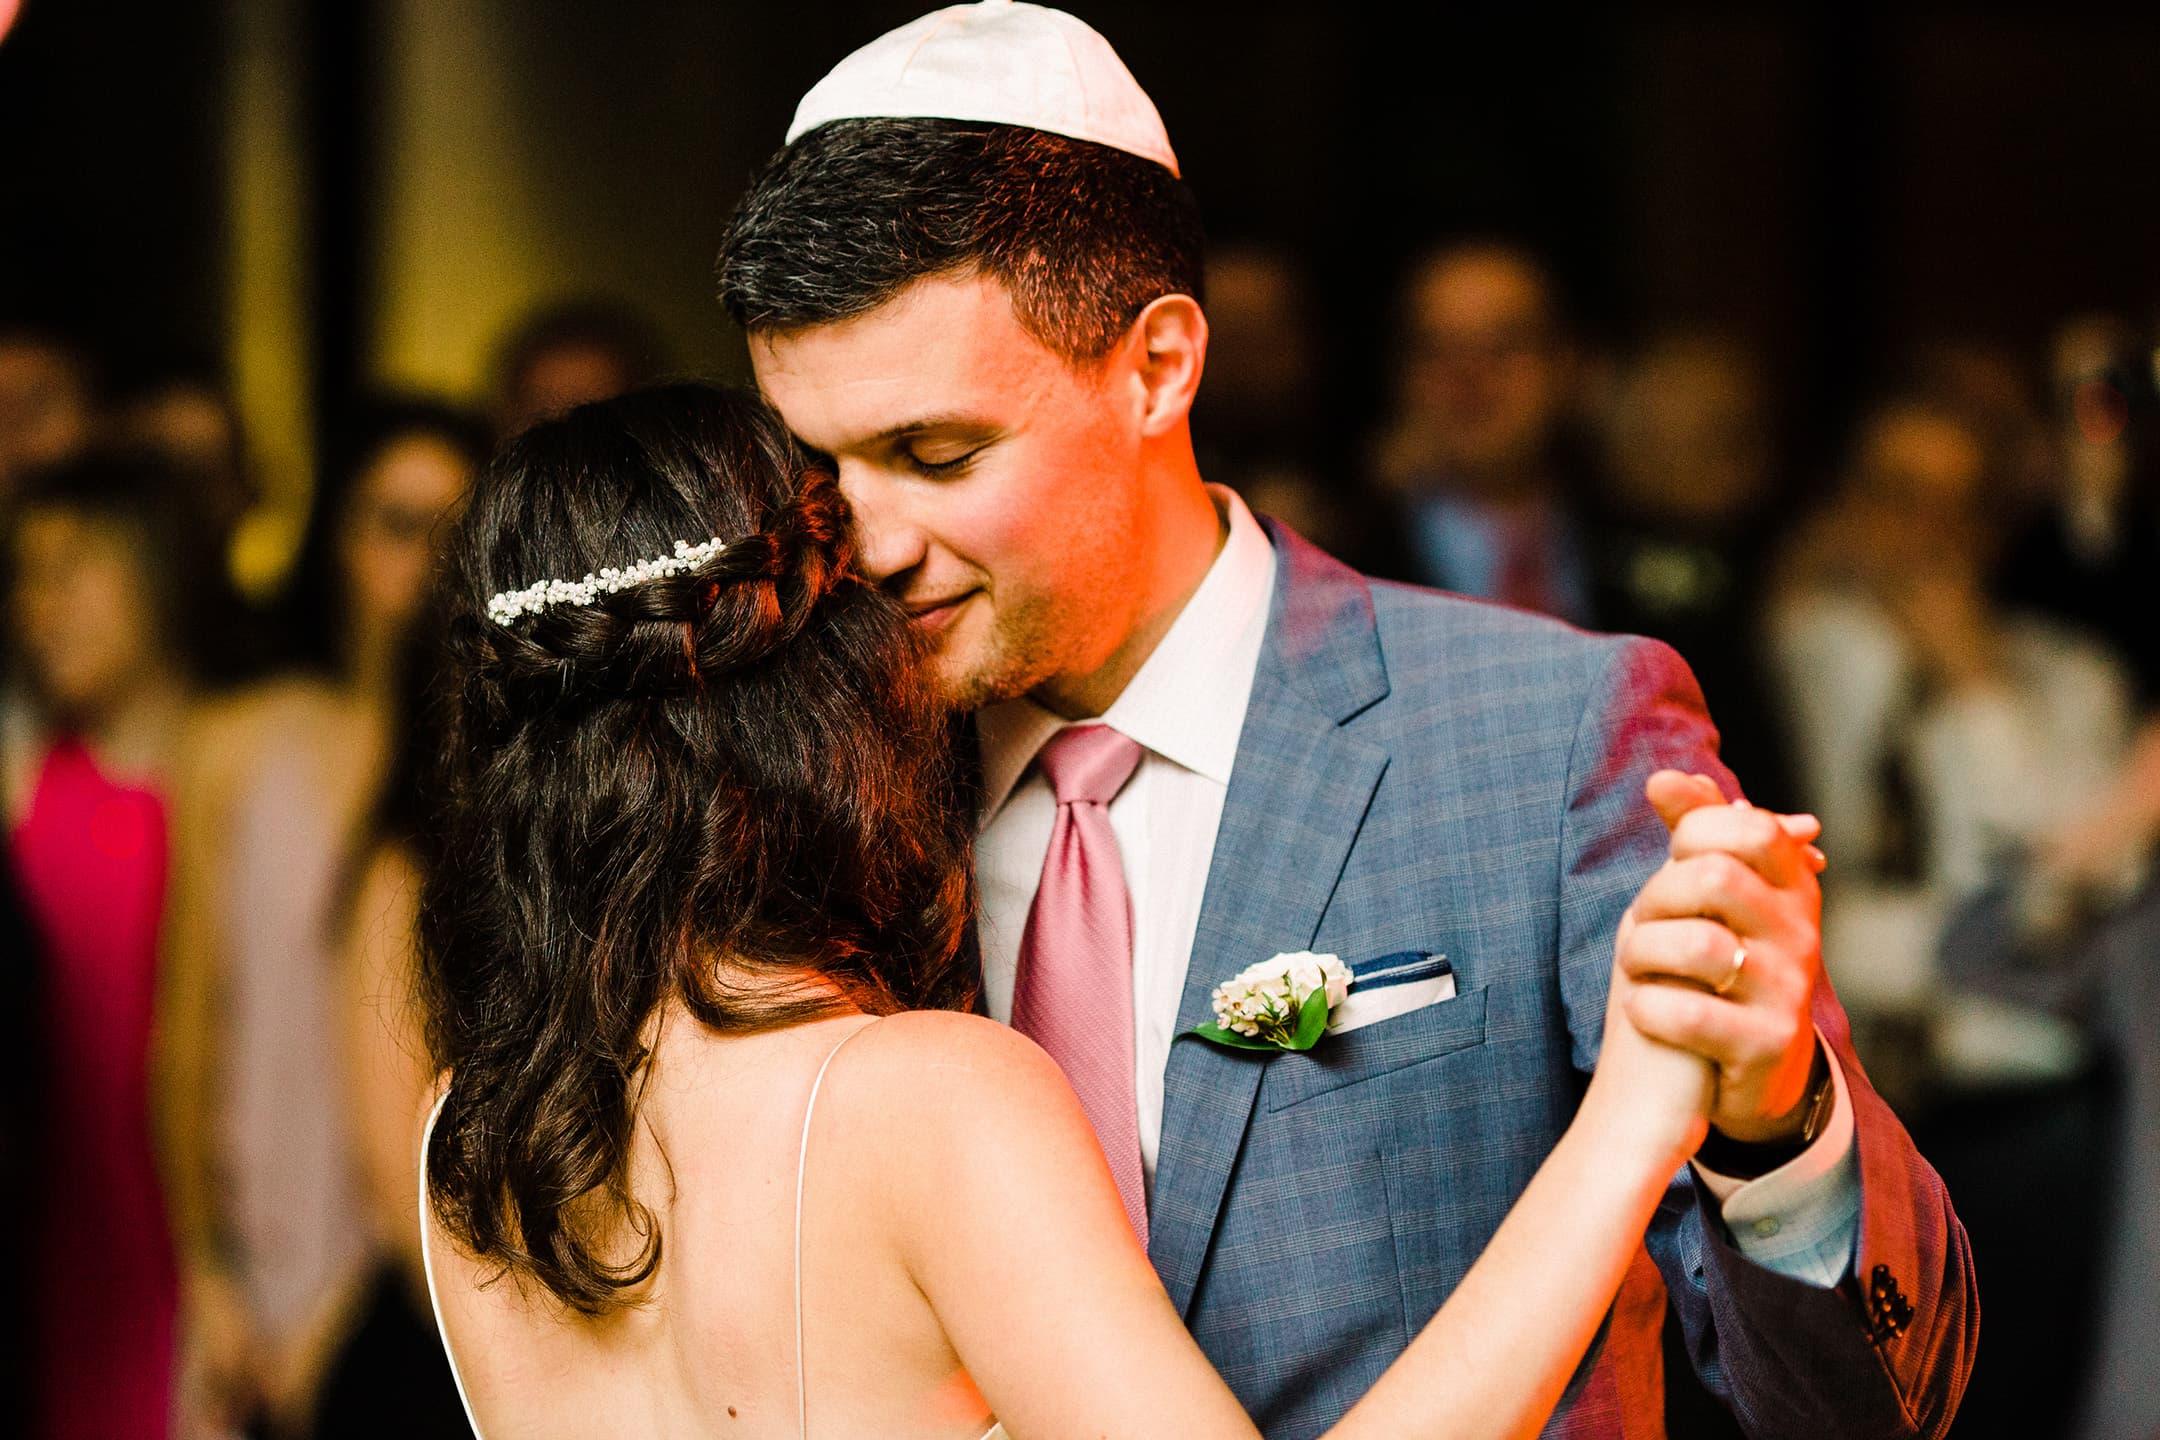 Jewish Groom dances with Bride at wedding